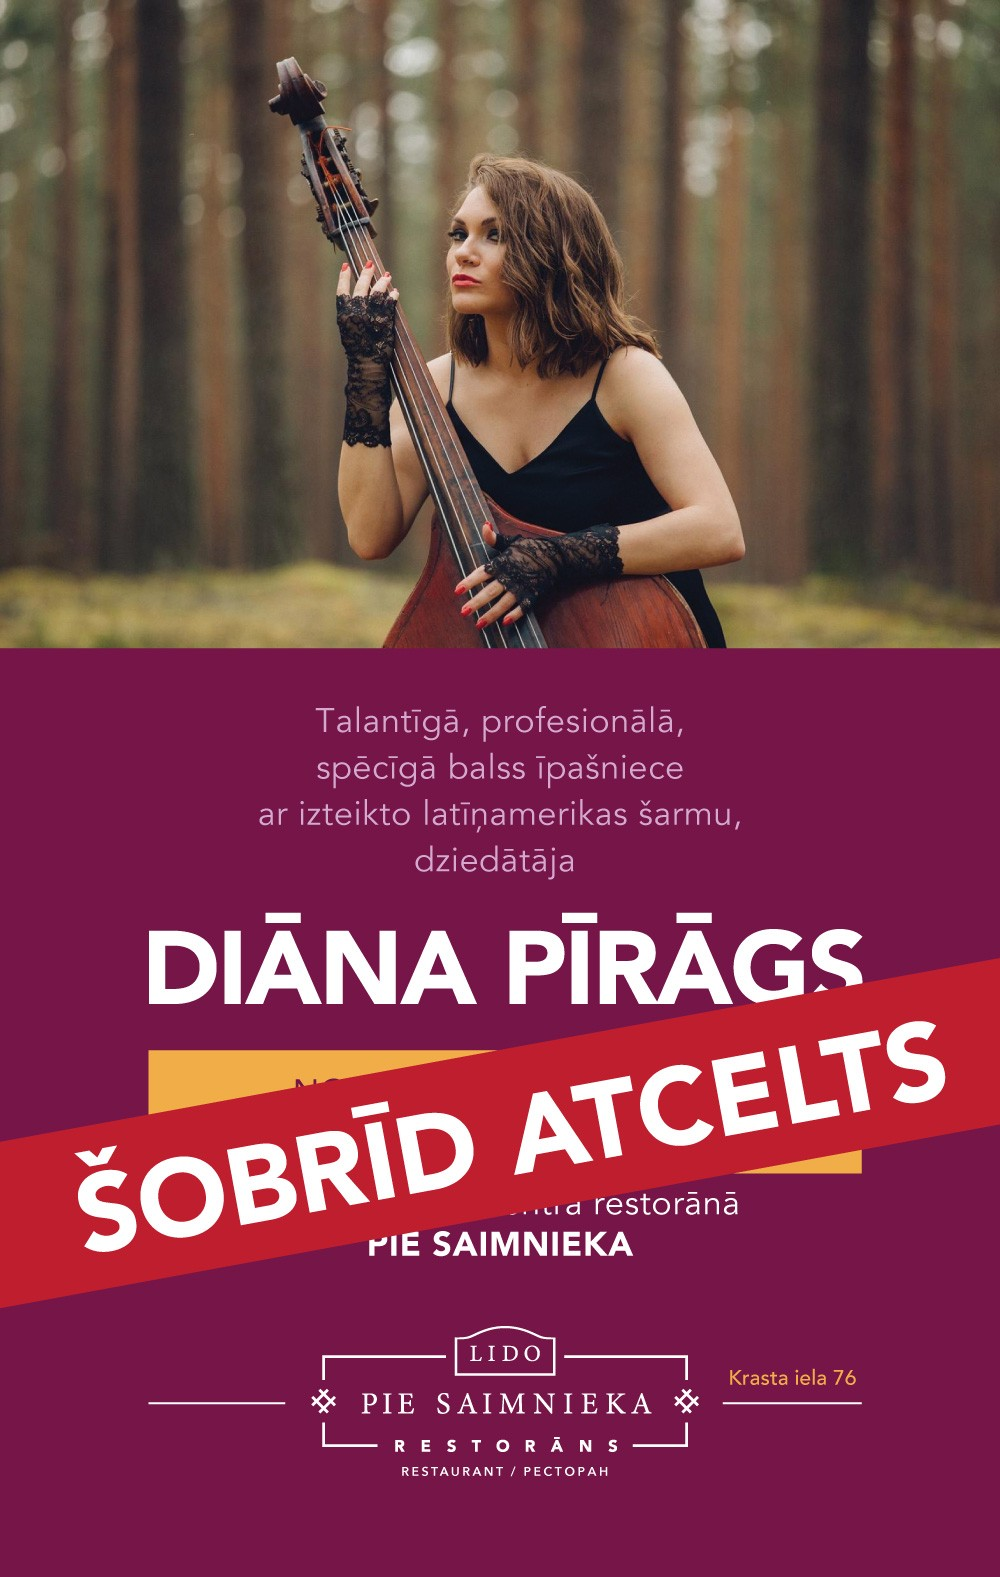 DianaPirags-Sestdienas-WEBAM---ATCELTS.jpg